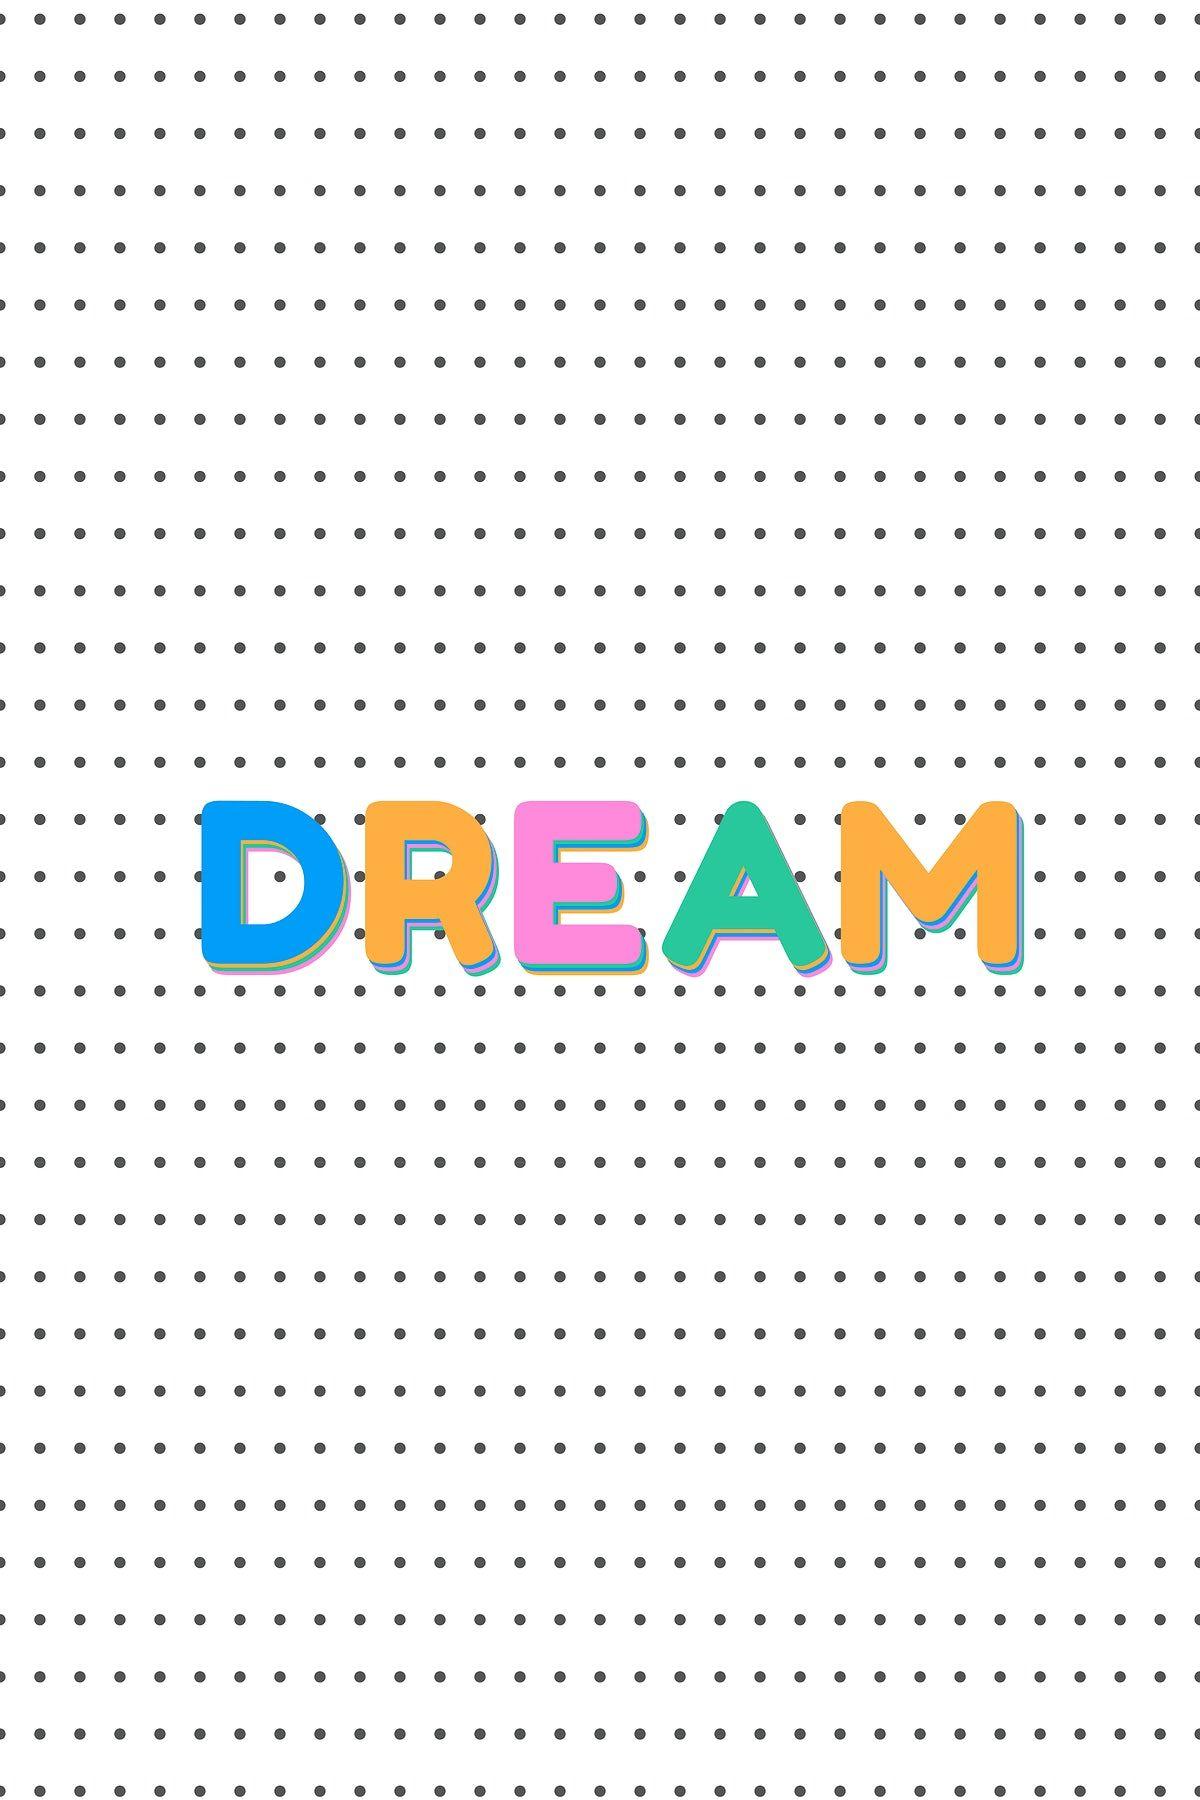 Word Text Art : Dream, Typography, Image, Rawpixel.com